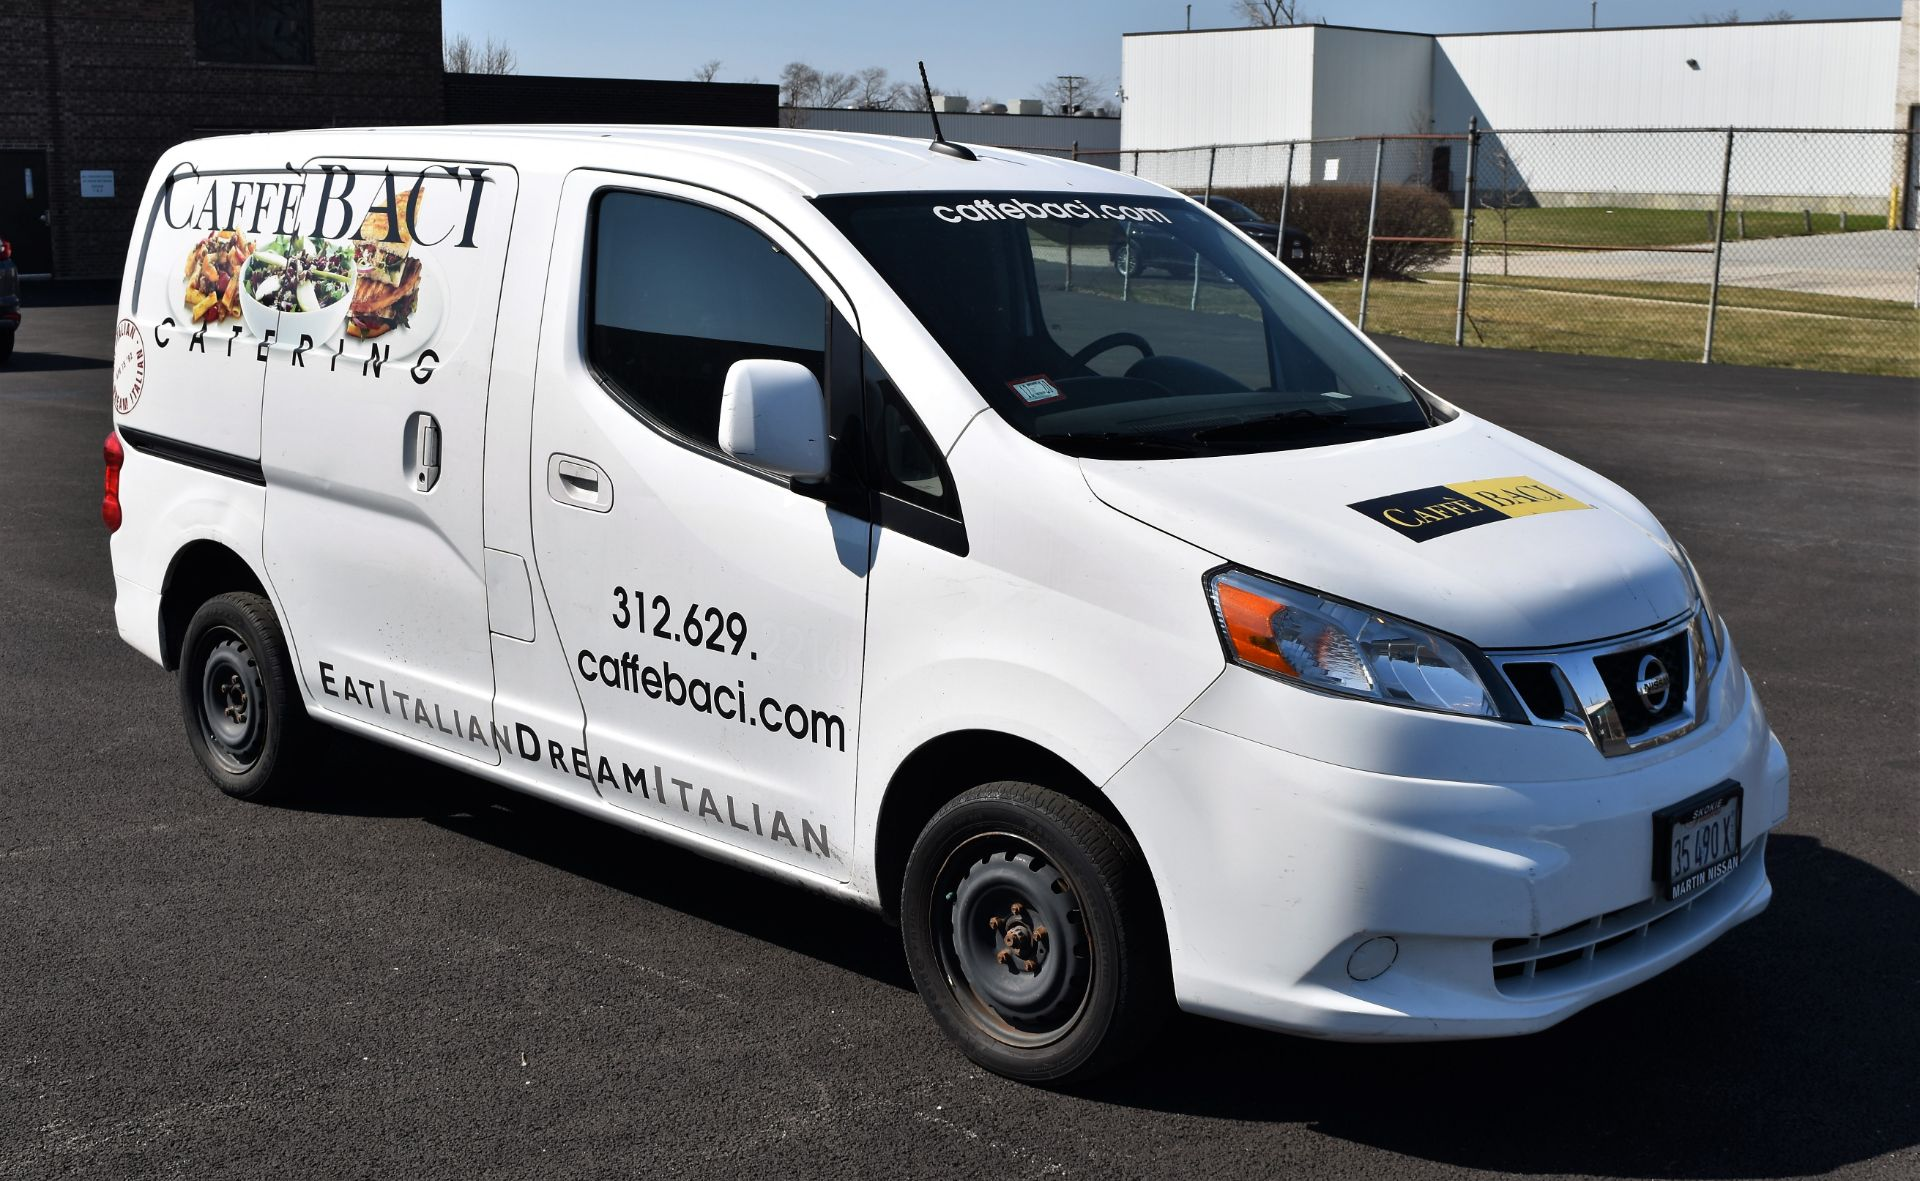 2013 Nissan NV200 Delivery Van - Image 47 of 54